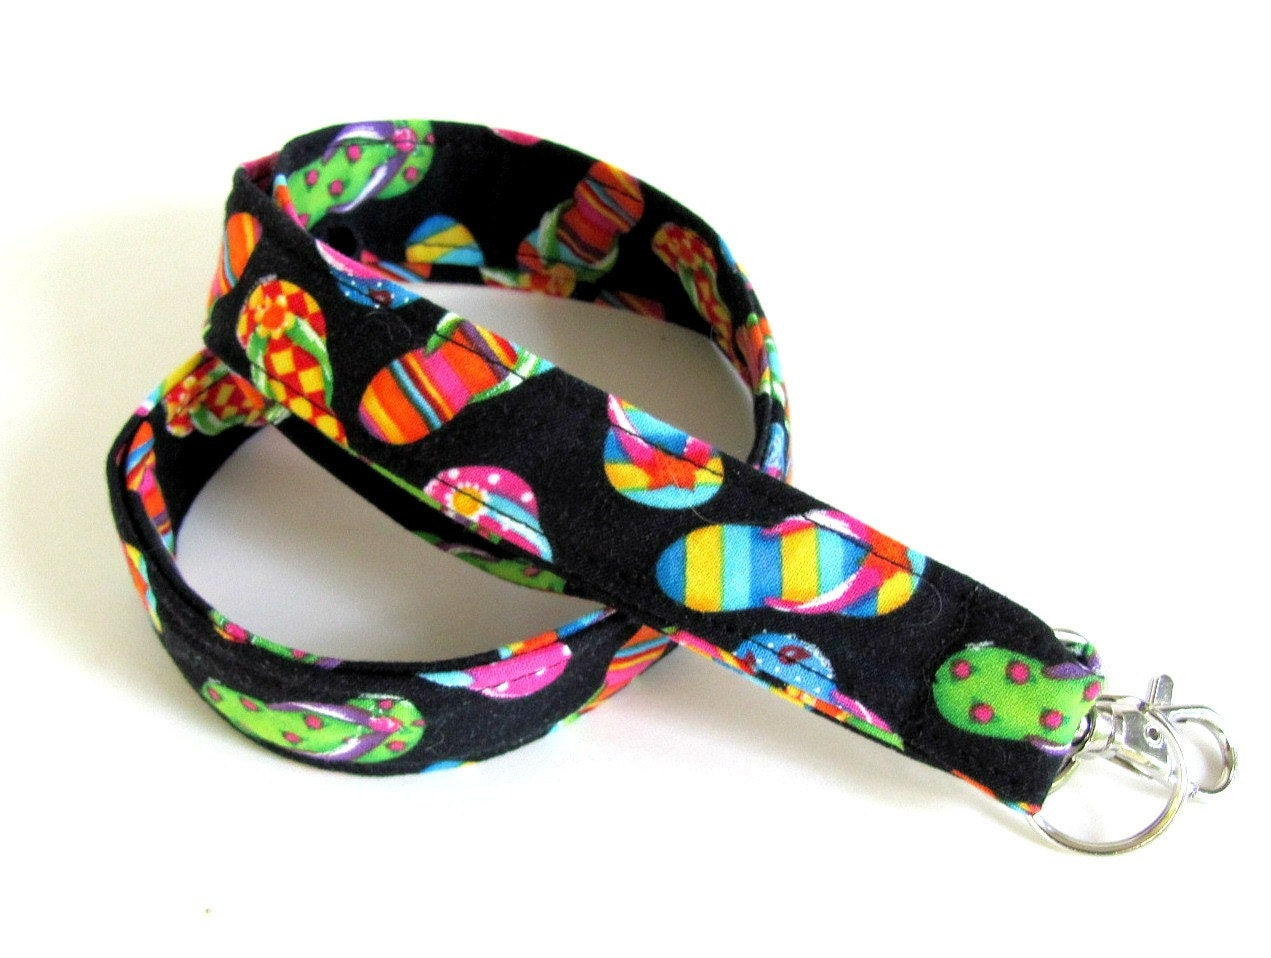 Fabric ID Badge Lanyard Summer Flip Flops Cotton Back to School Teacher Key Lanyard Girls Women Black Rainbow Beach Sandals